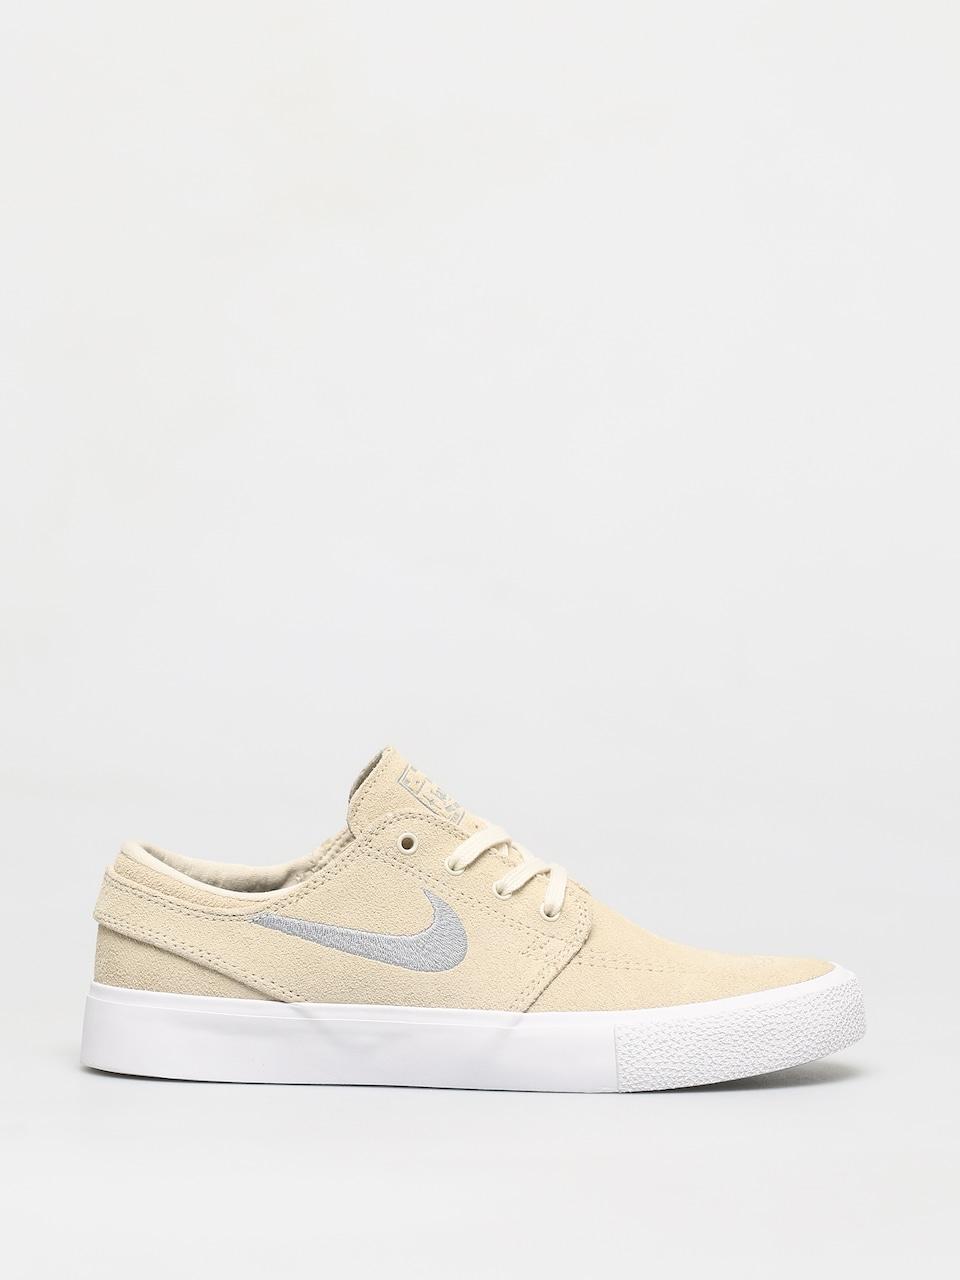 Nike SB: bluzy, buty skate, kurtki | SUPERSKLEP